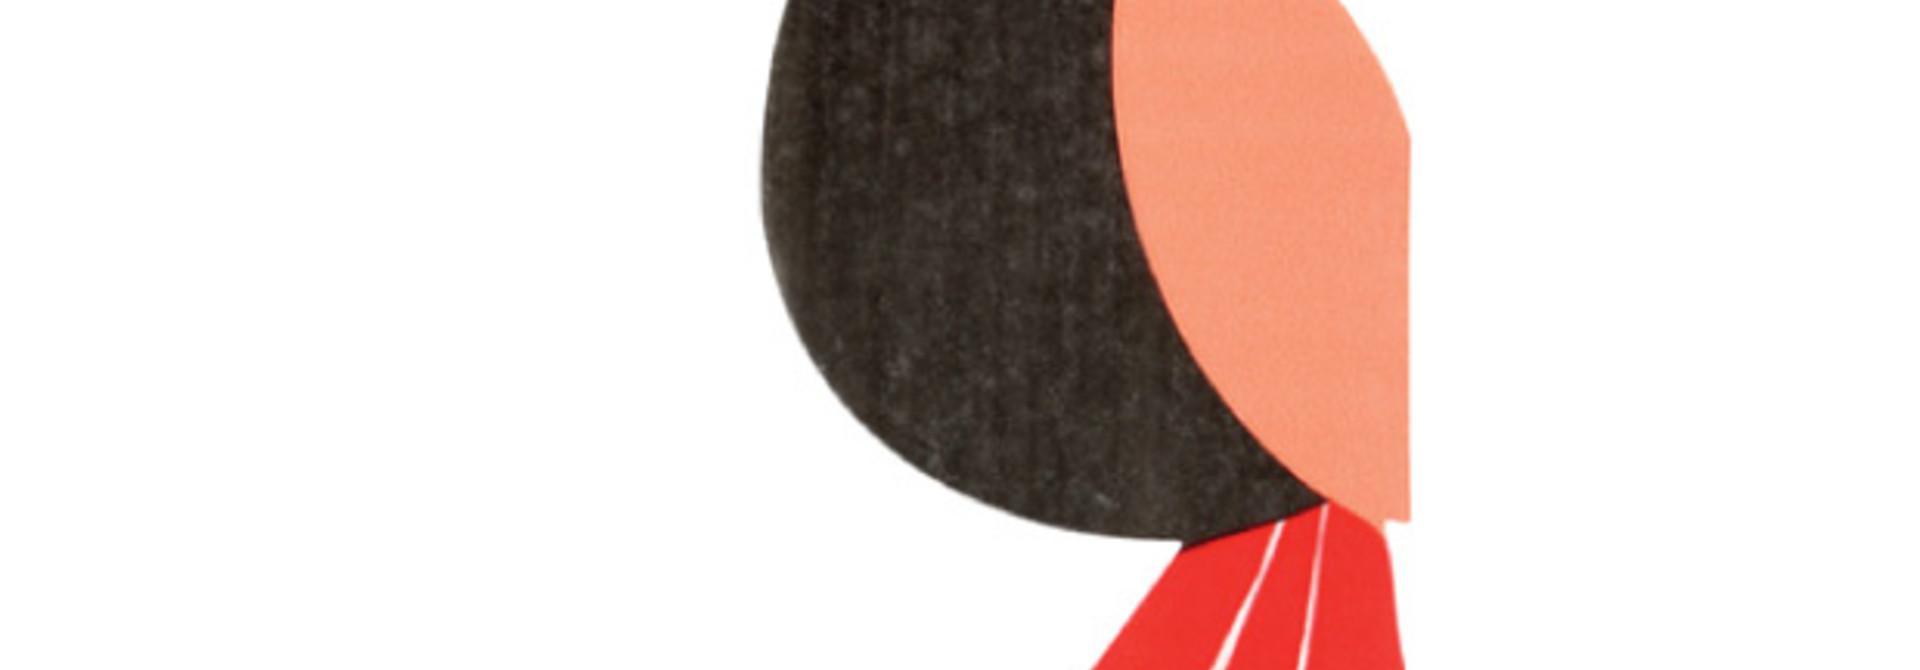 Servetten Toucan (20 st) - Meri Meri